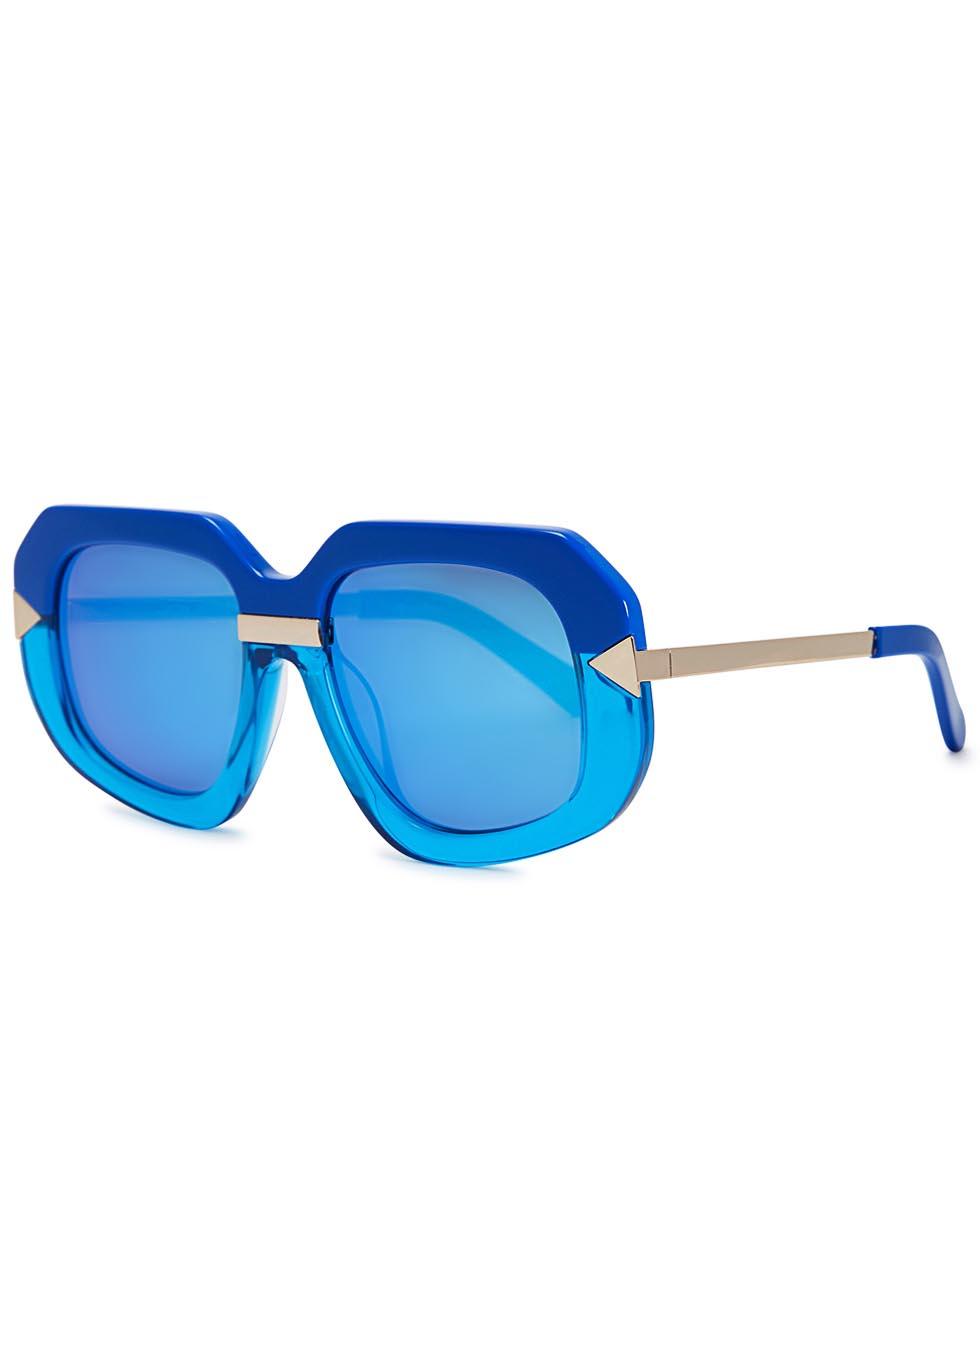 70b9c8c07553d Karen Walker Hollywood Creeper Blue Mirrored Sunglasses in Blue - Lyst